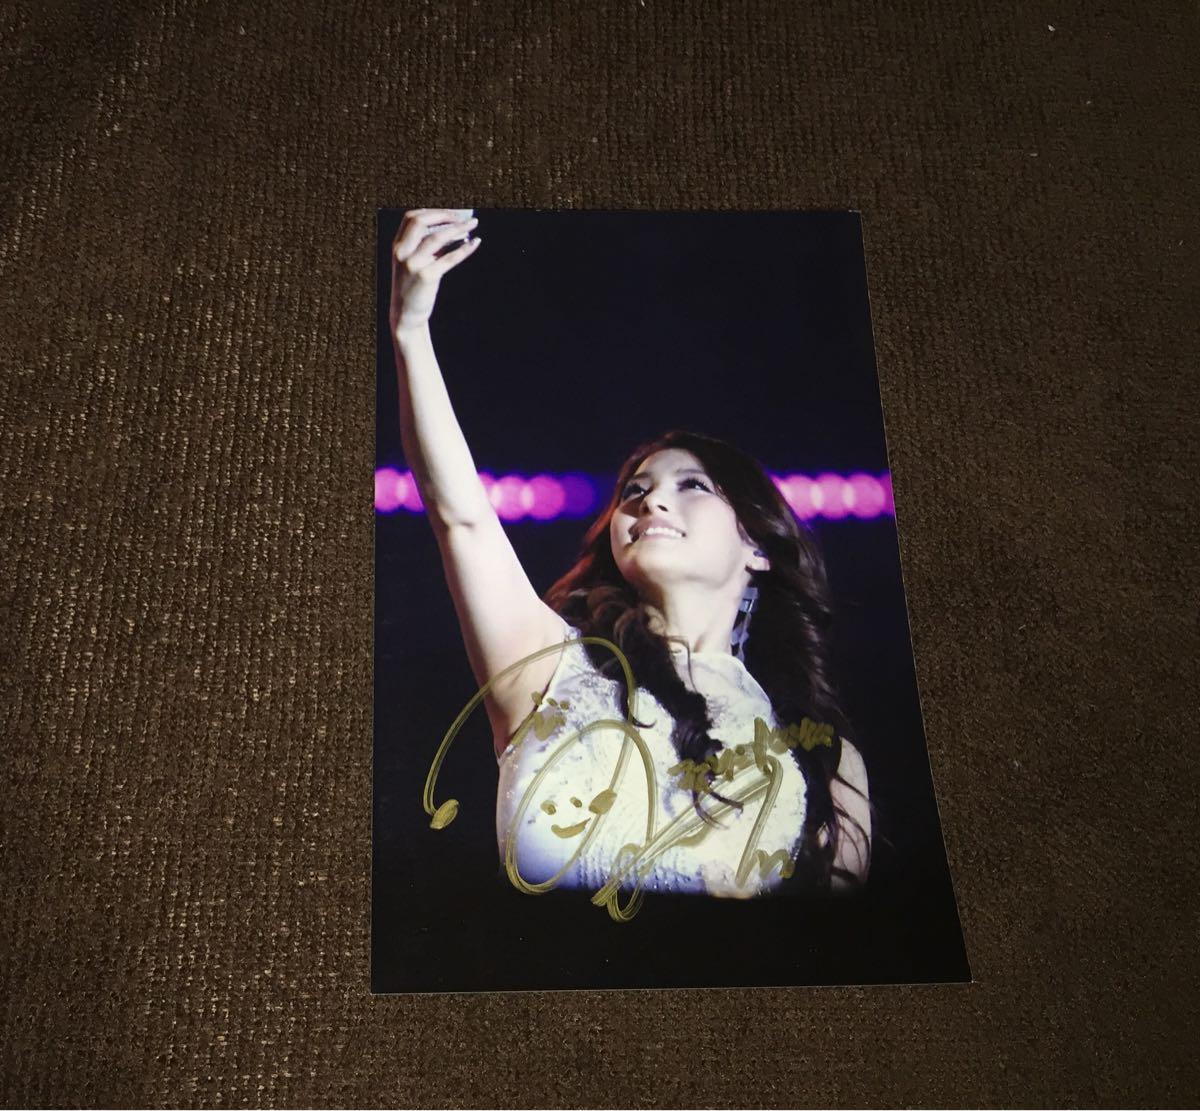 ▲KARA/カラ▲『Gyuri/パク・ギュリ』 直筆サイン入りブロマイド写真#4 [コレクターズアイテム]